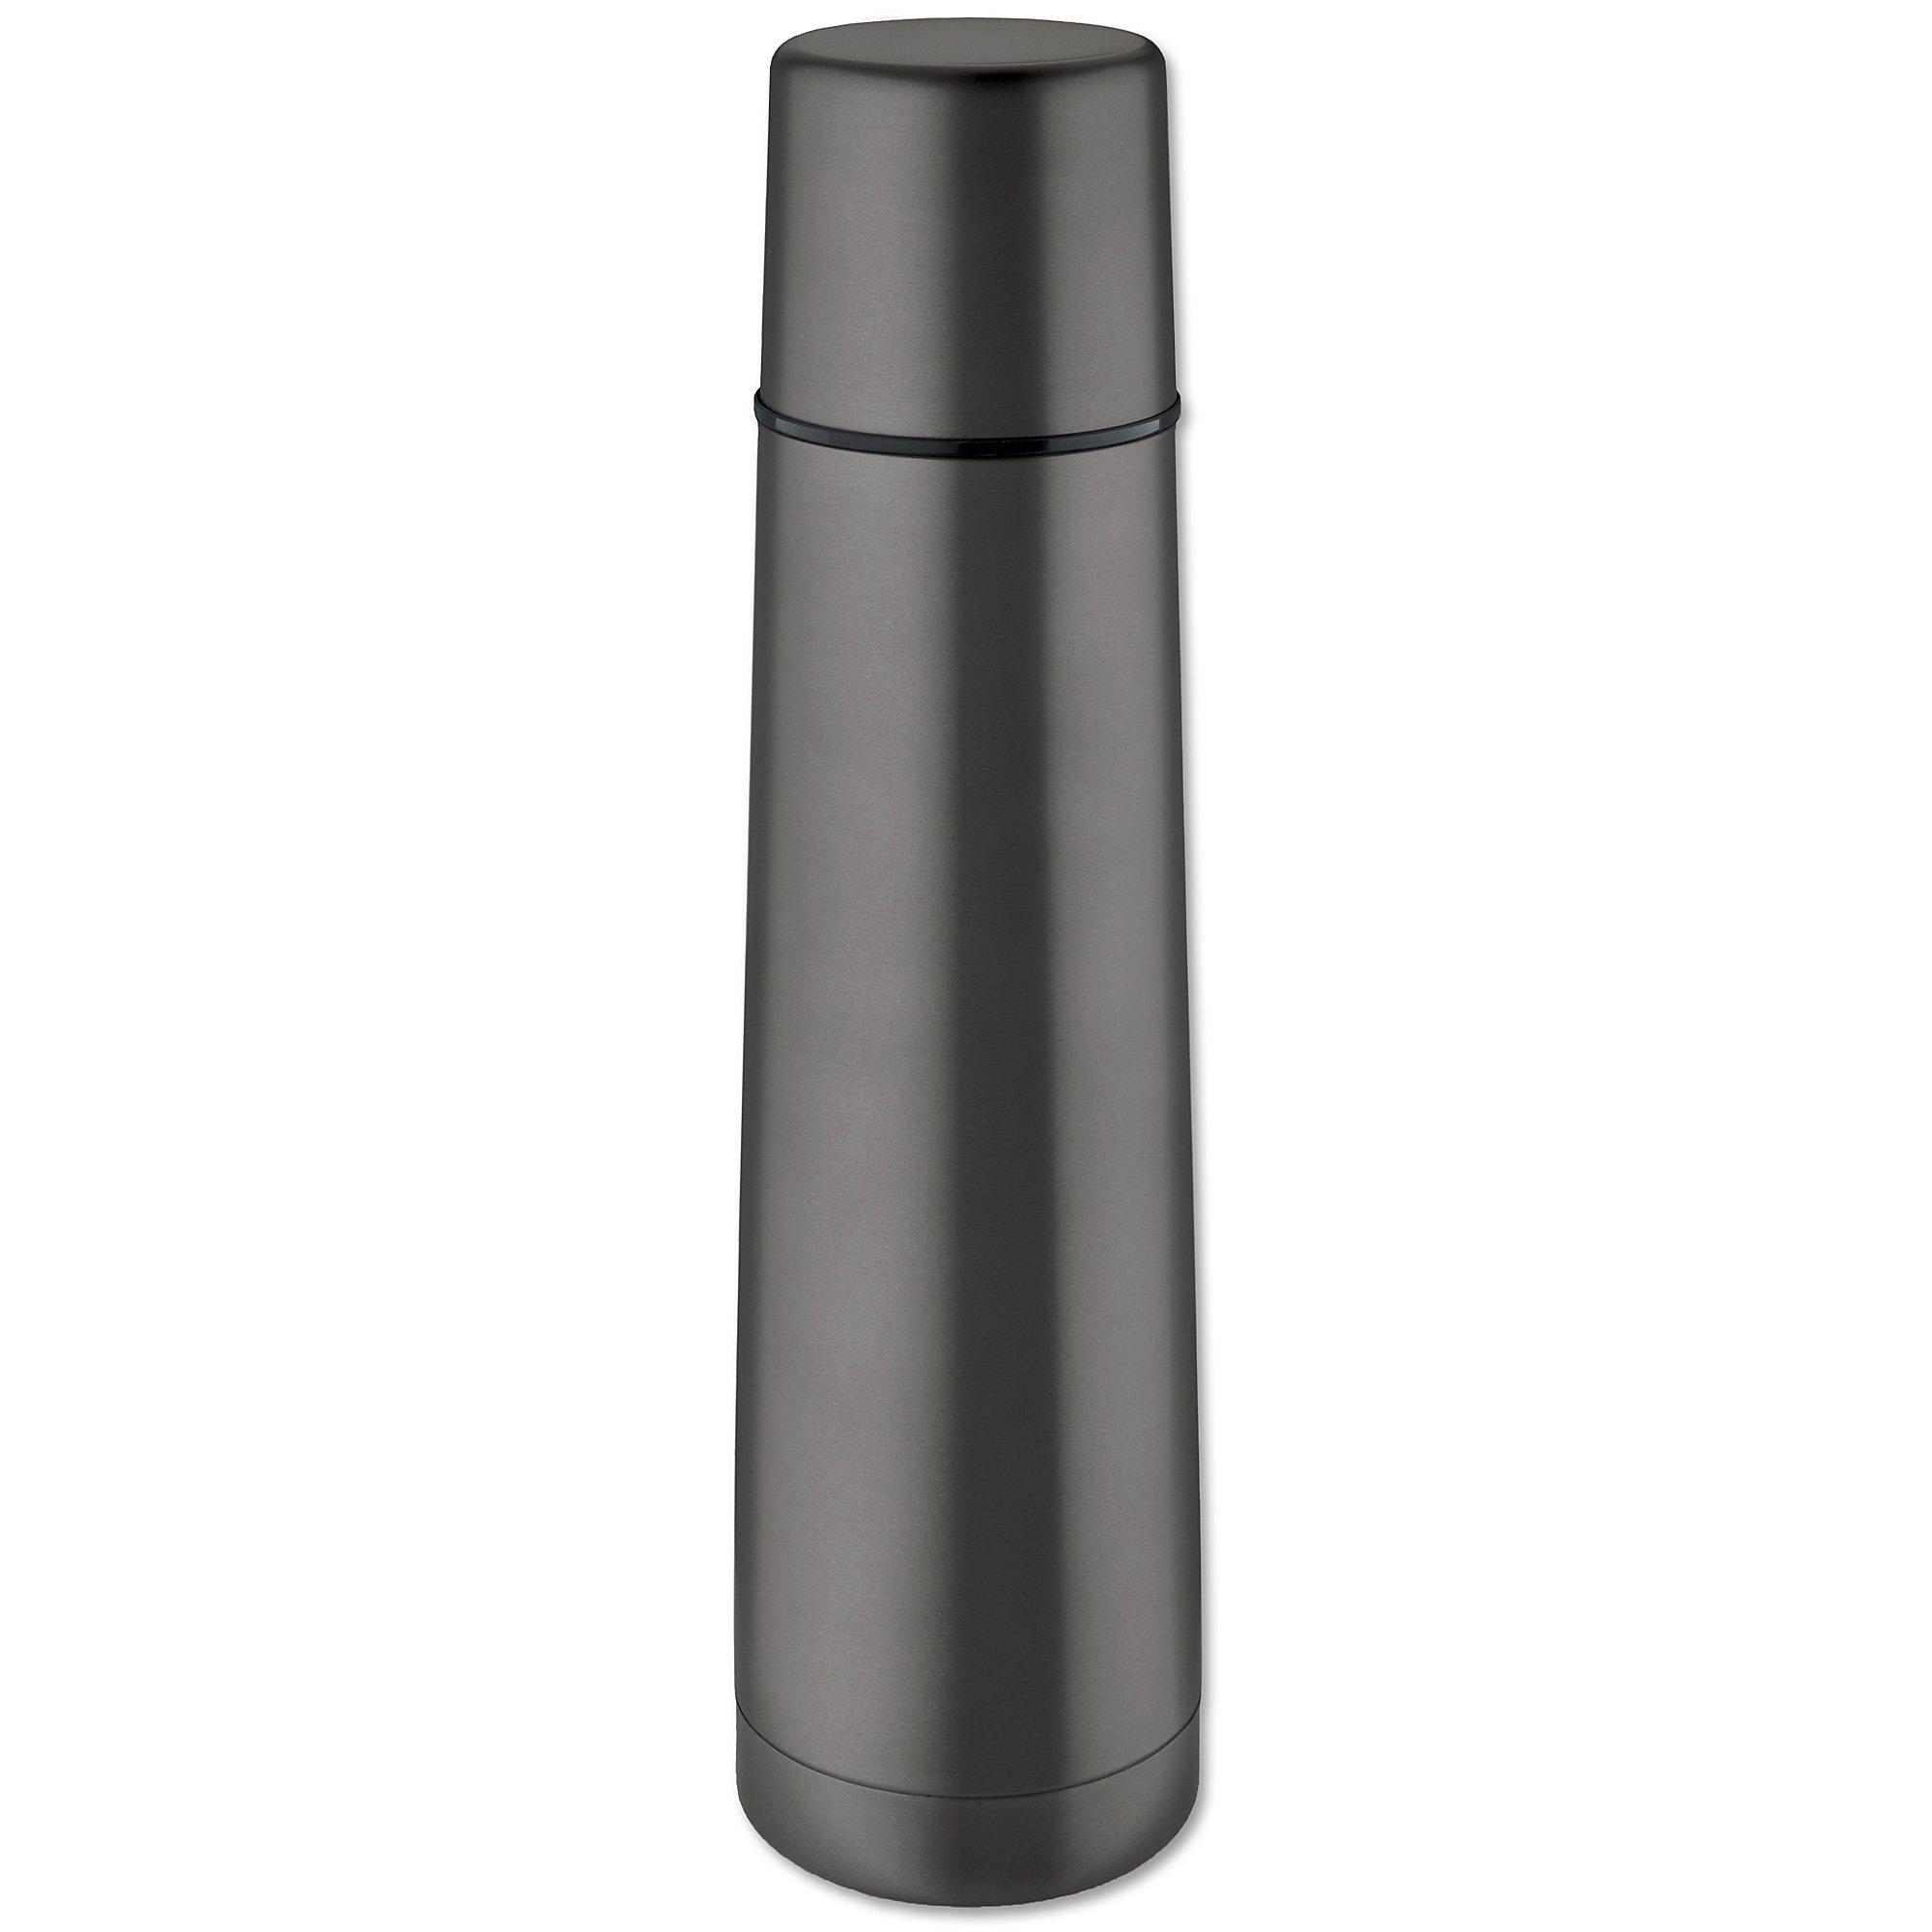 Isosteel VA-9554QAT 0.9 Litre 18/ 8 Stainless Steel Slimline Double-Walled Vacuum Flask, Titanium Gray